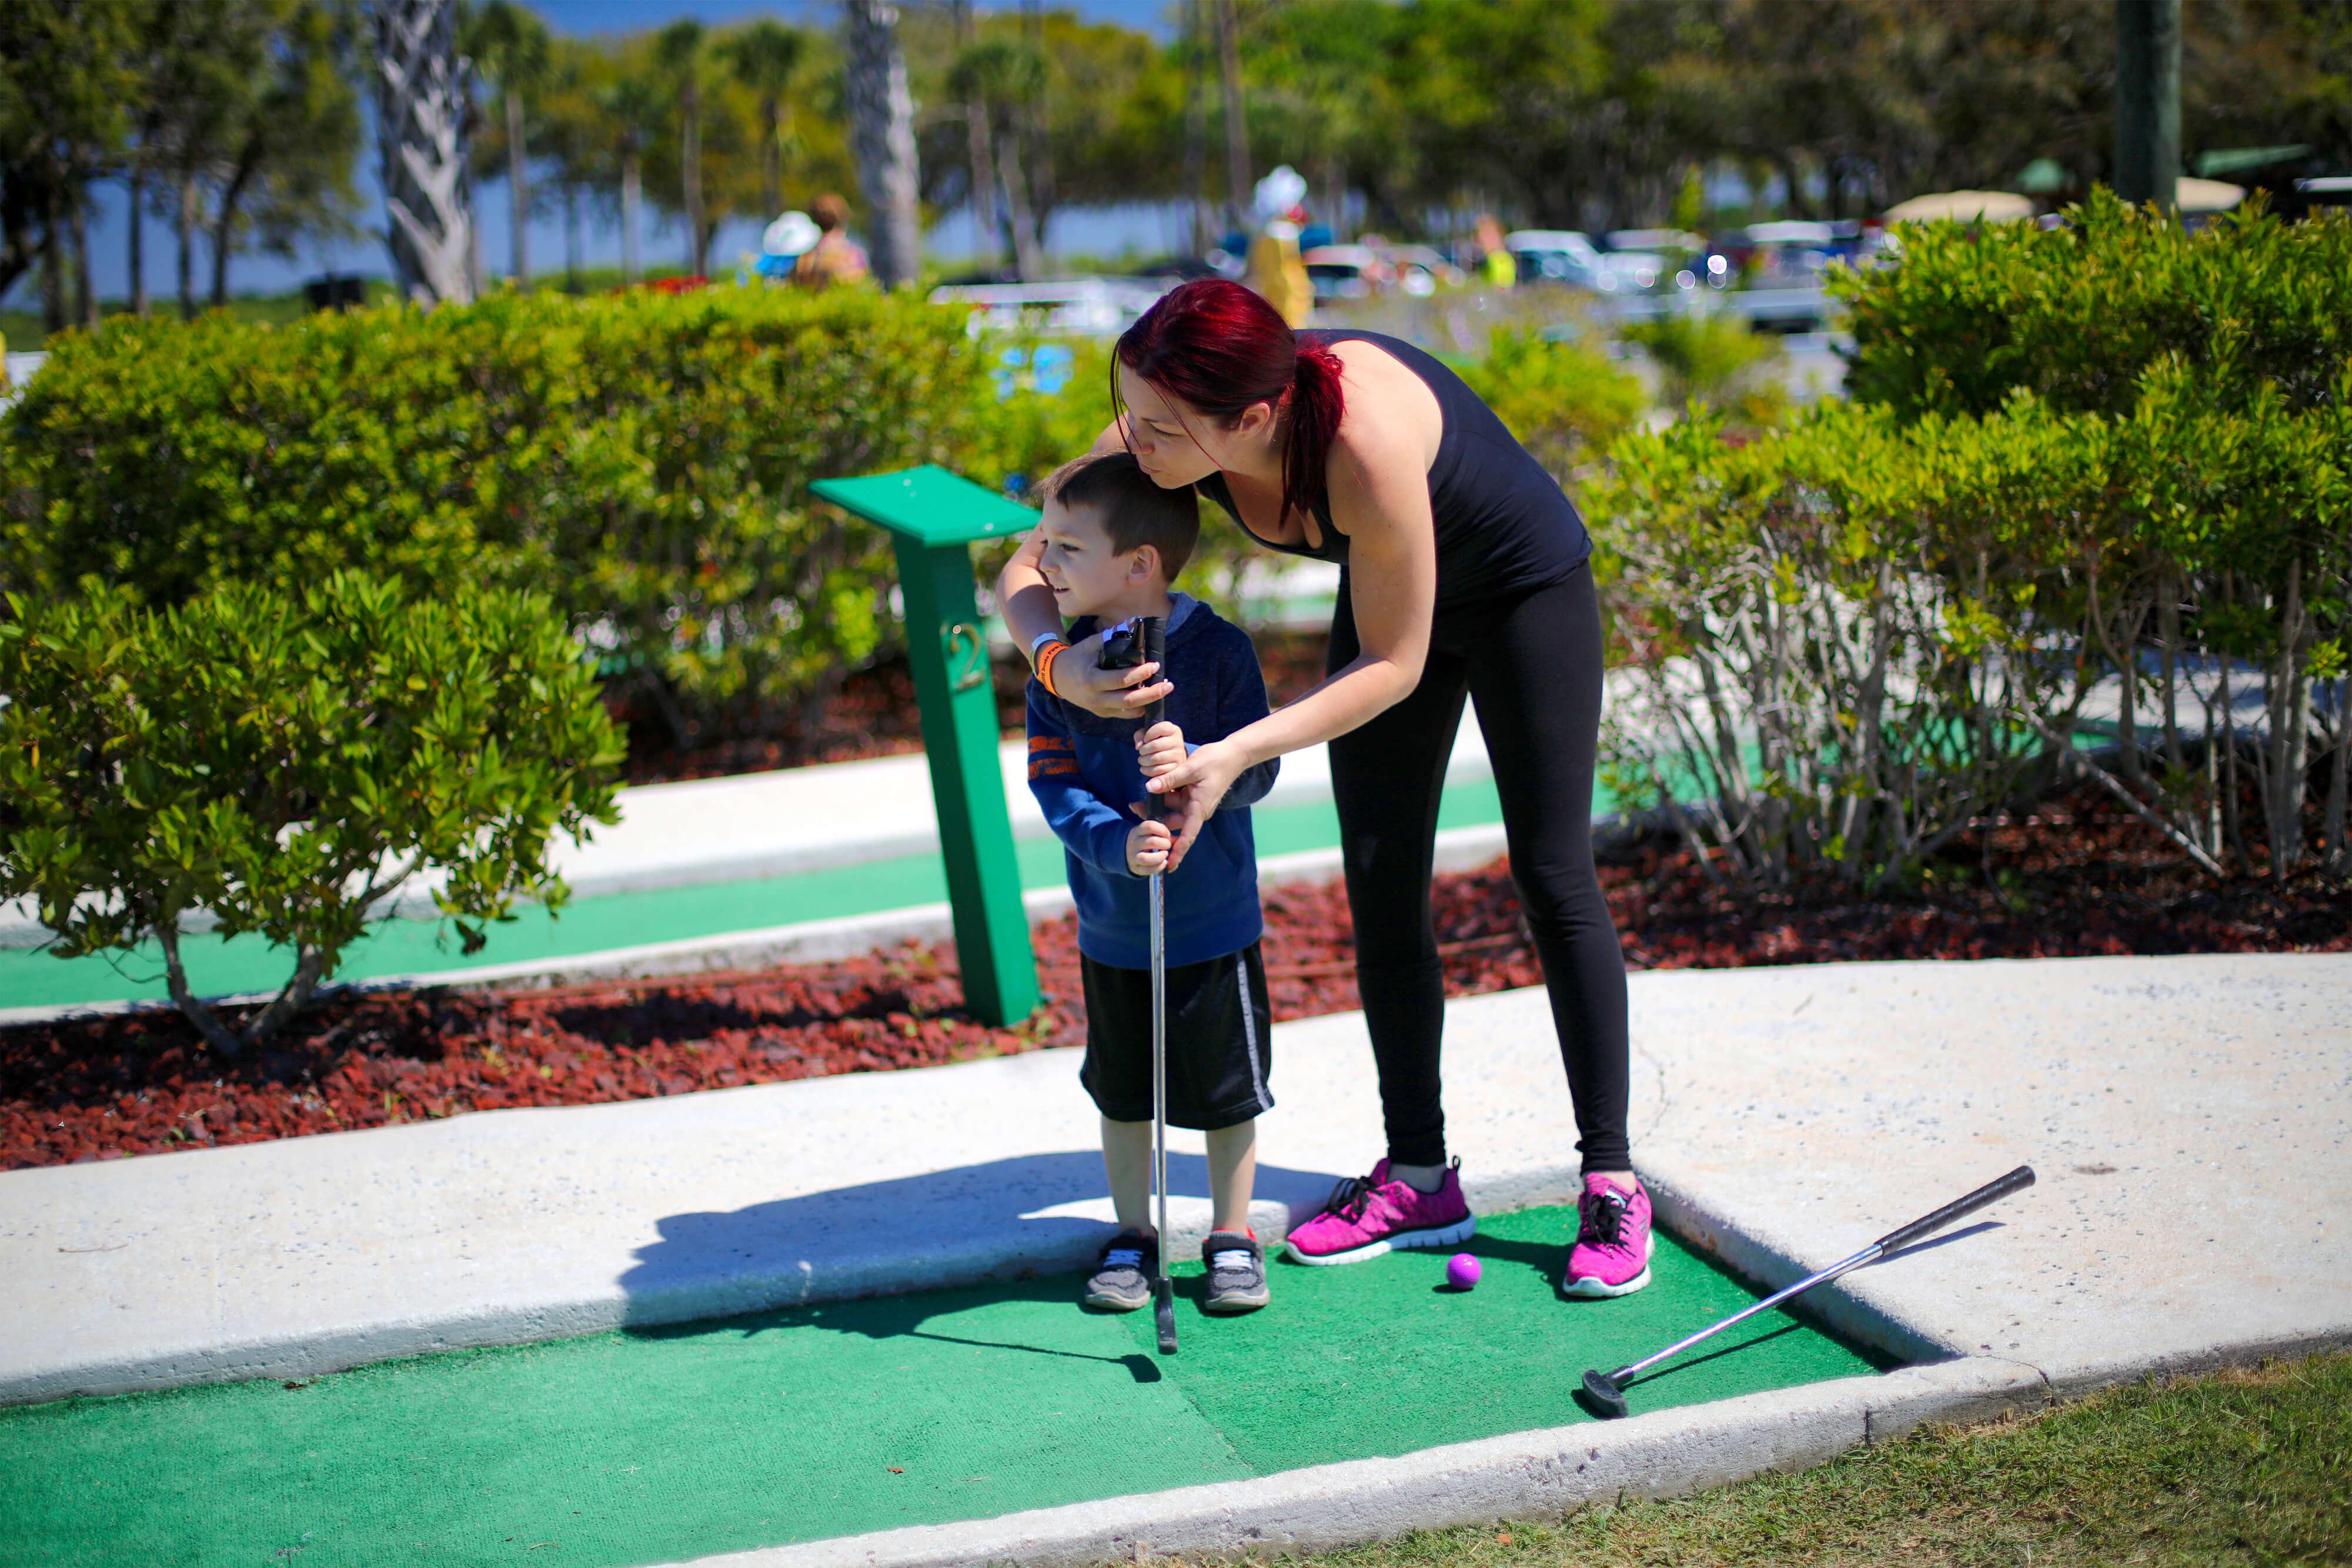 Family Mini Golf in River Ranch, FL |  Westgate River Ranch Resort & Rodeo | Westgate Resorts